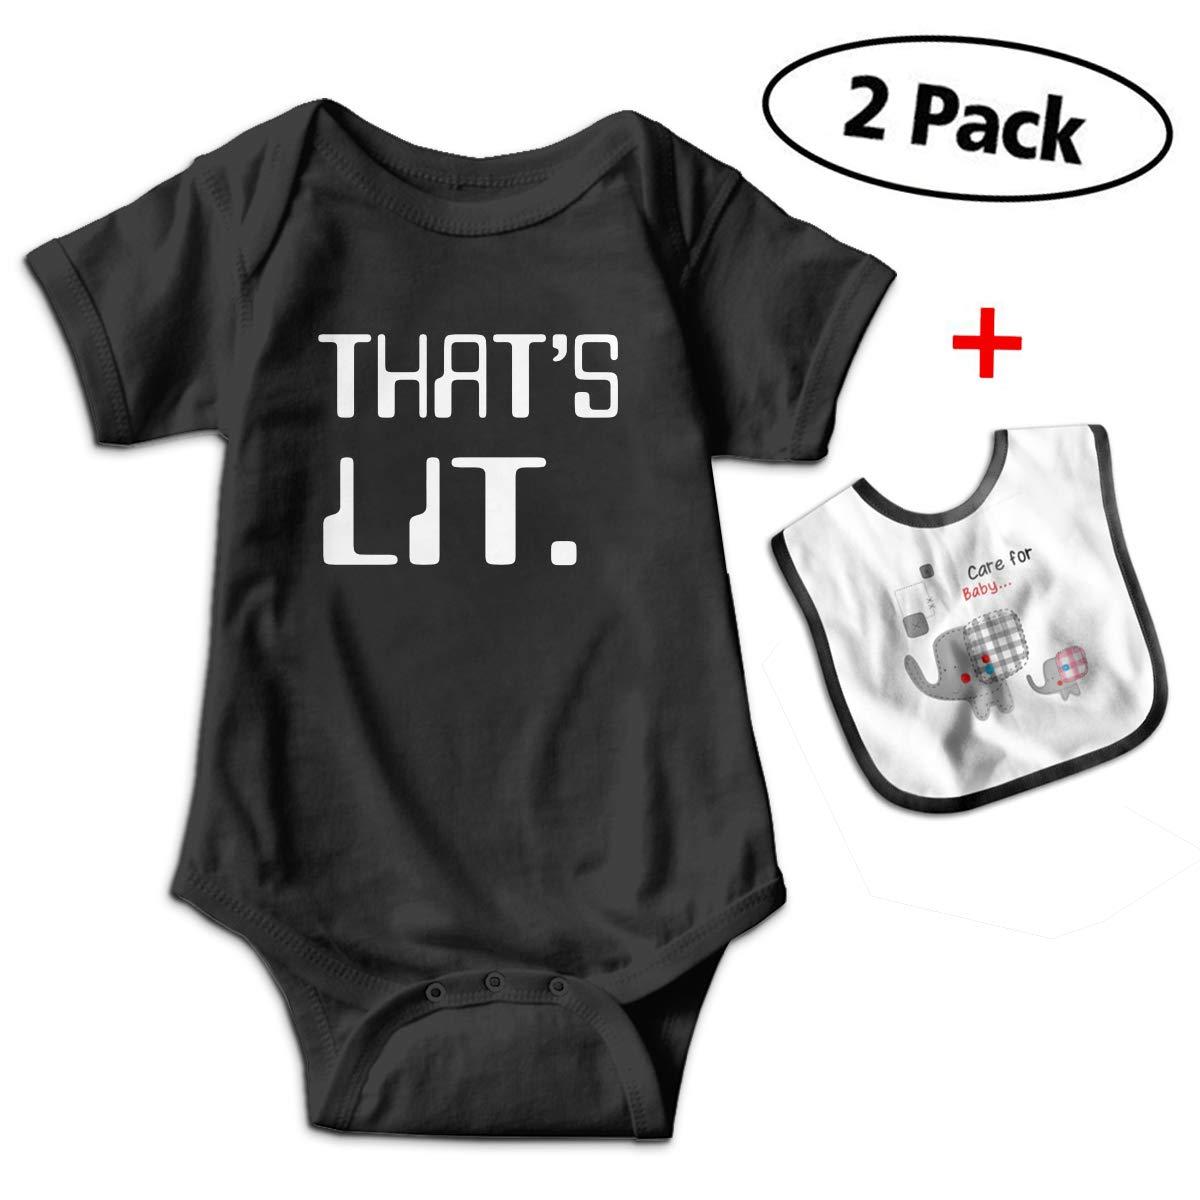 KAYERDELLE Geek LIT Babys Kids Short Sleeve Bodysuit Baby Onesie for 3-24 Months and Baby Bib